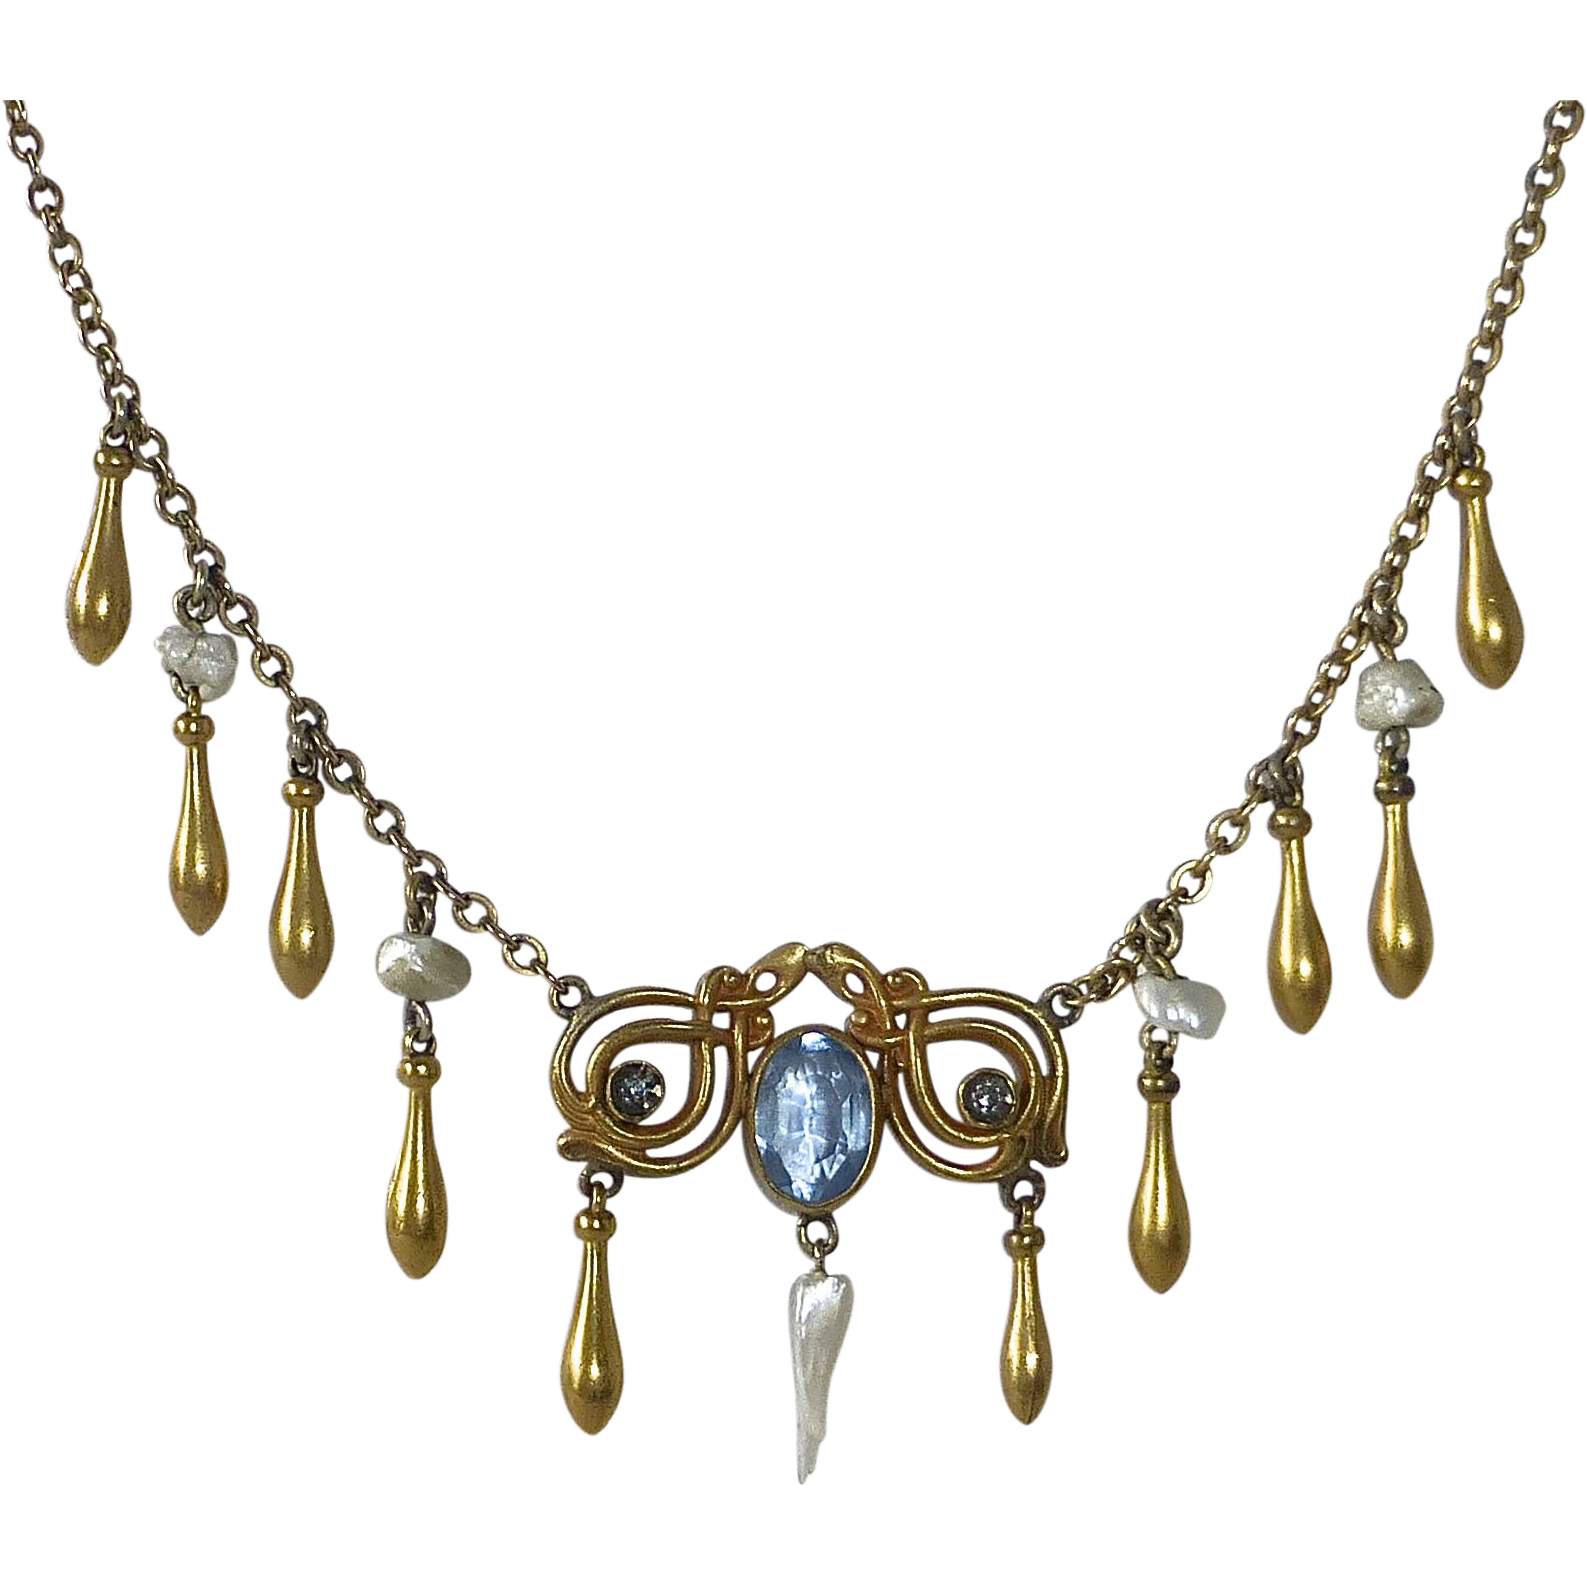 Edwardian Gold Filled Necklace FWP & Teardrops